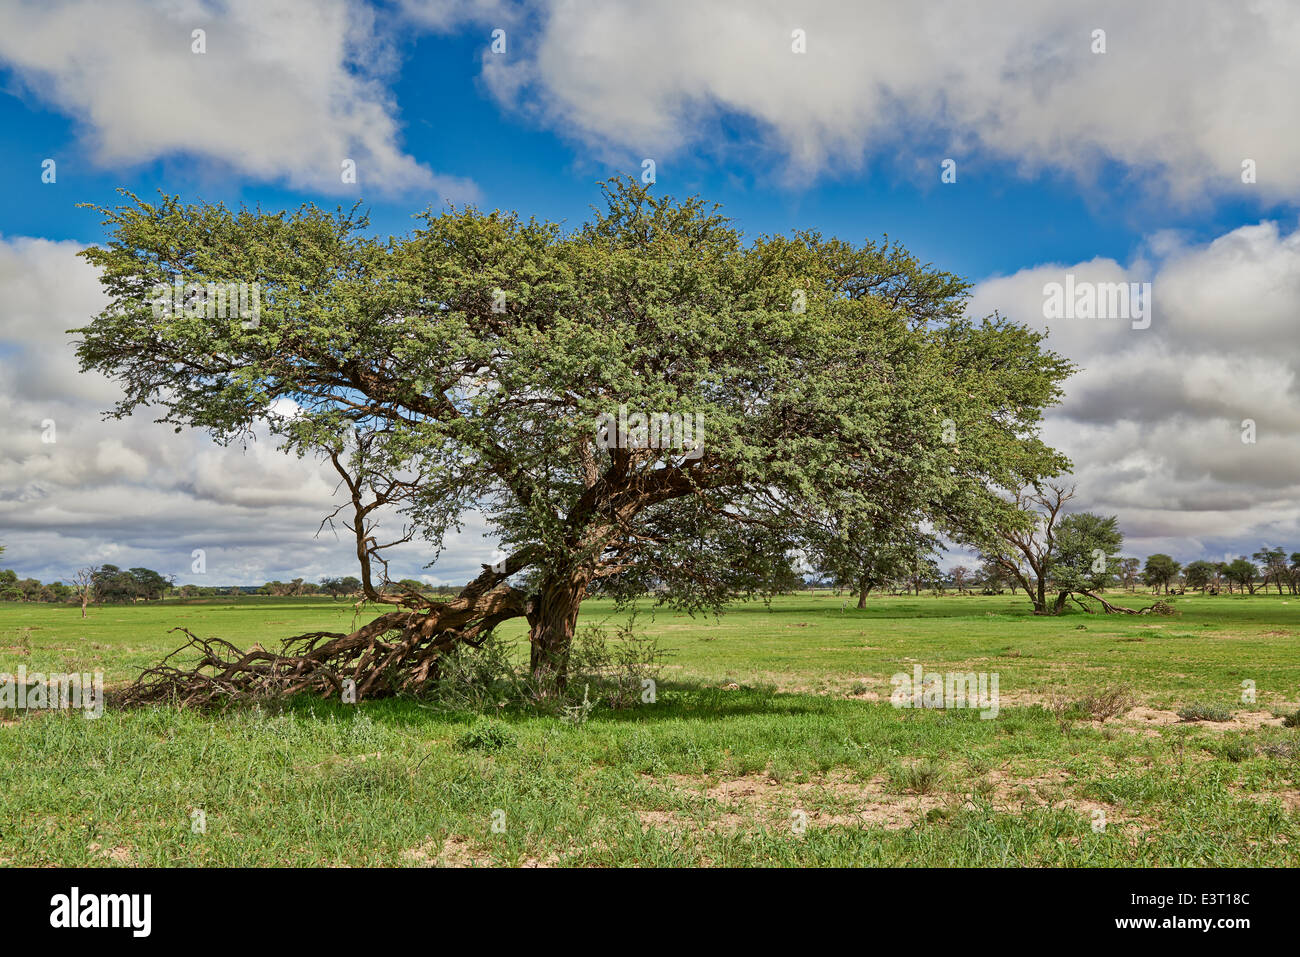 Paesaggio con alberi di acacia nel Kgalagadi Parco transfrontaliero, il Kalahari, Sud Africa, Botswana, Africa Immagini Stock